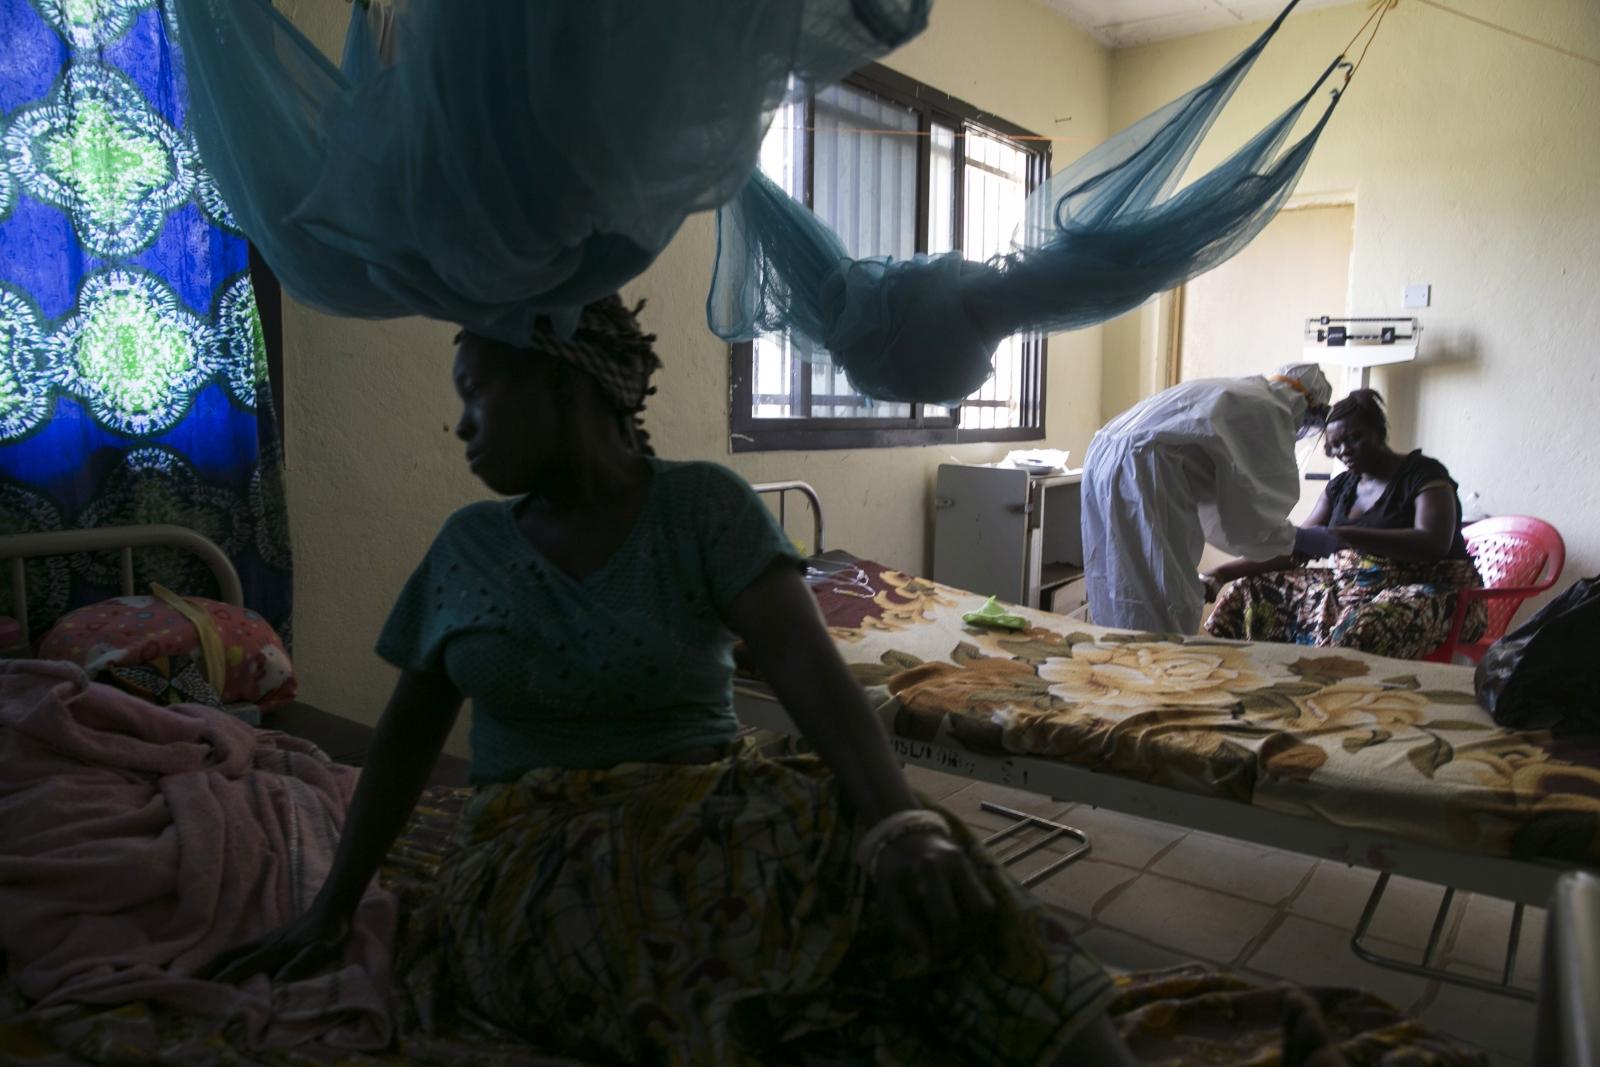 Ebola: Sierra Leone announces 3-day lockdown of 2.5 million people